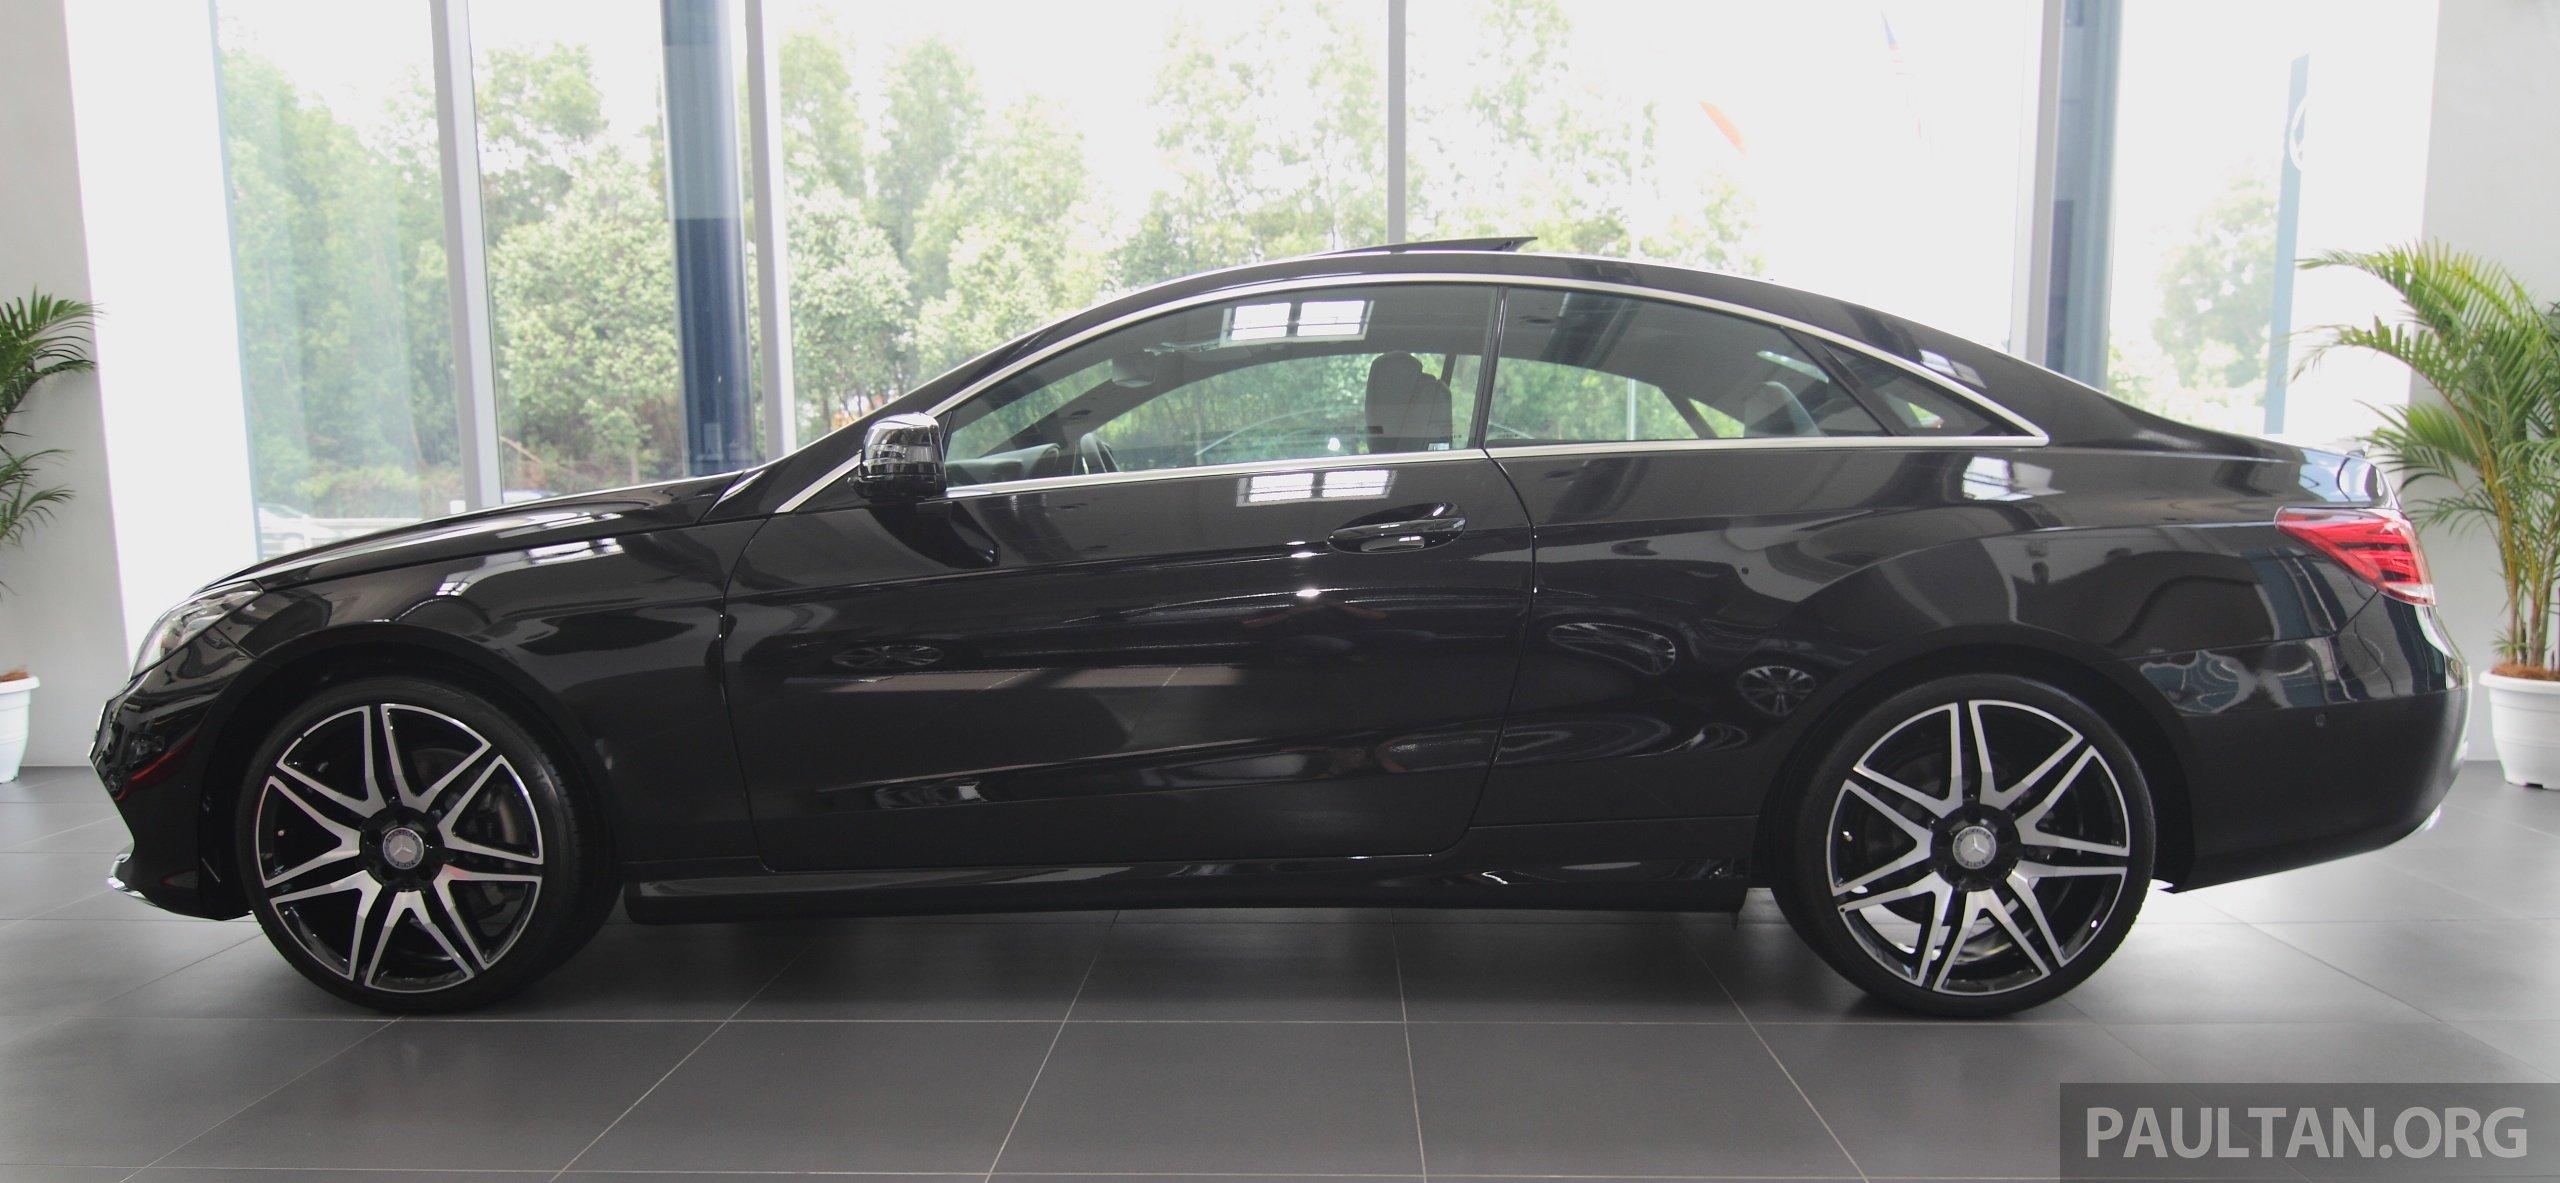 mercedes e 250 coupe facelift is here rm490 888 image 270918. Black Bedroom Furniture Sets. Home Design Ideas